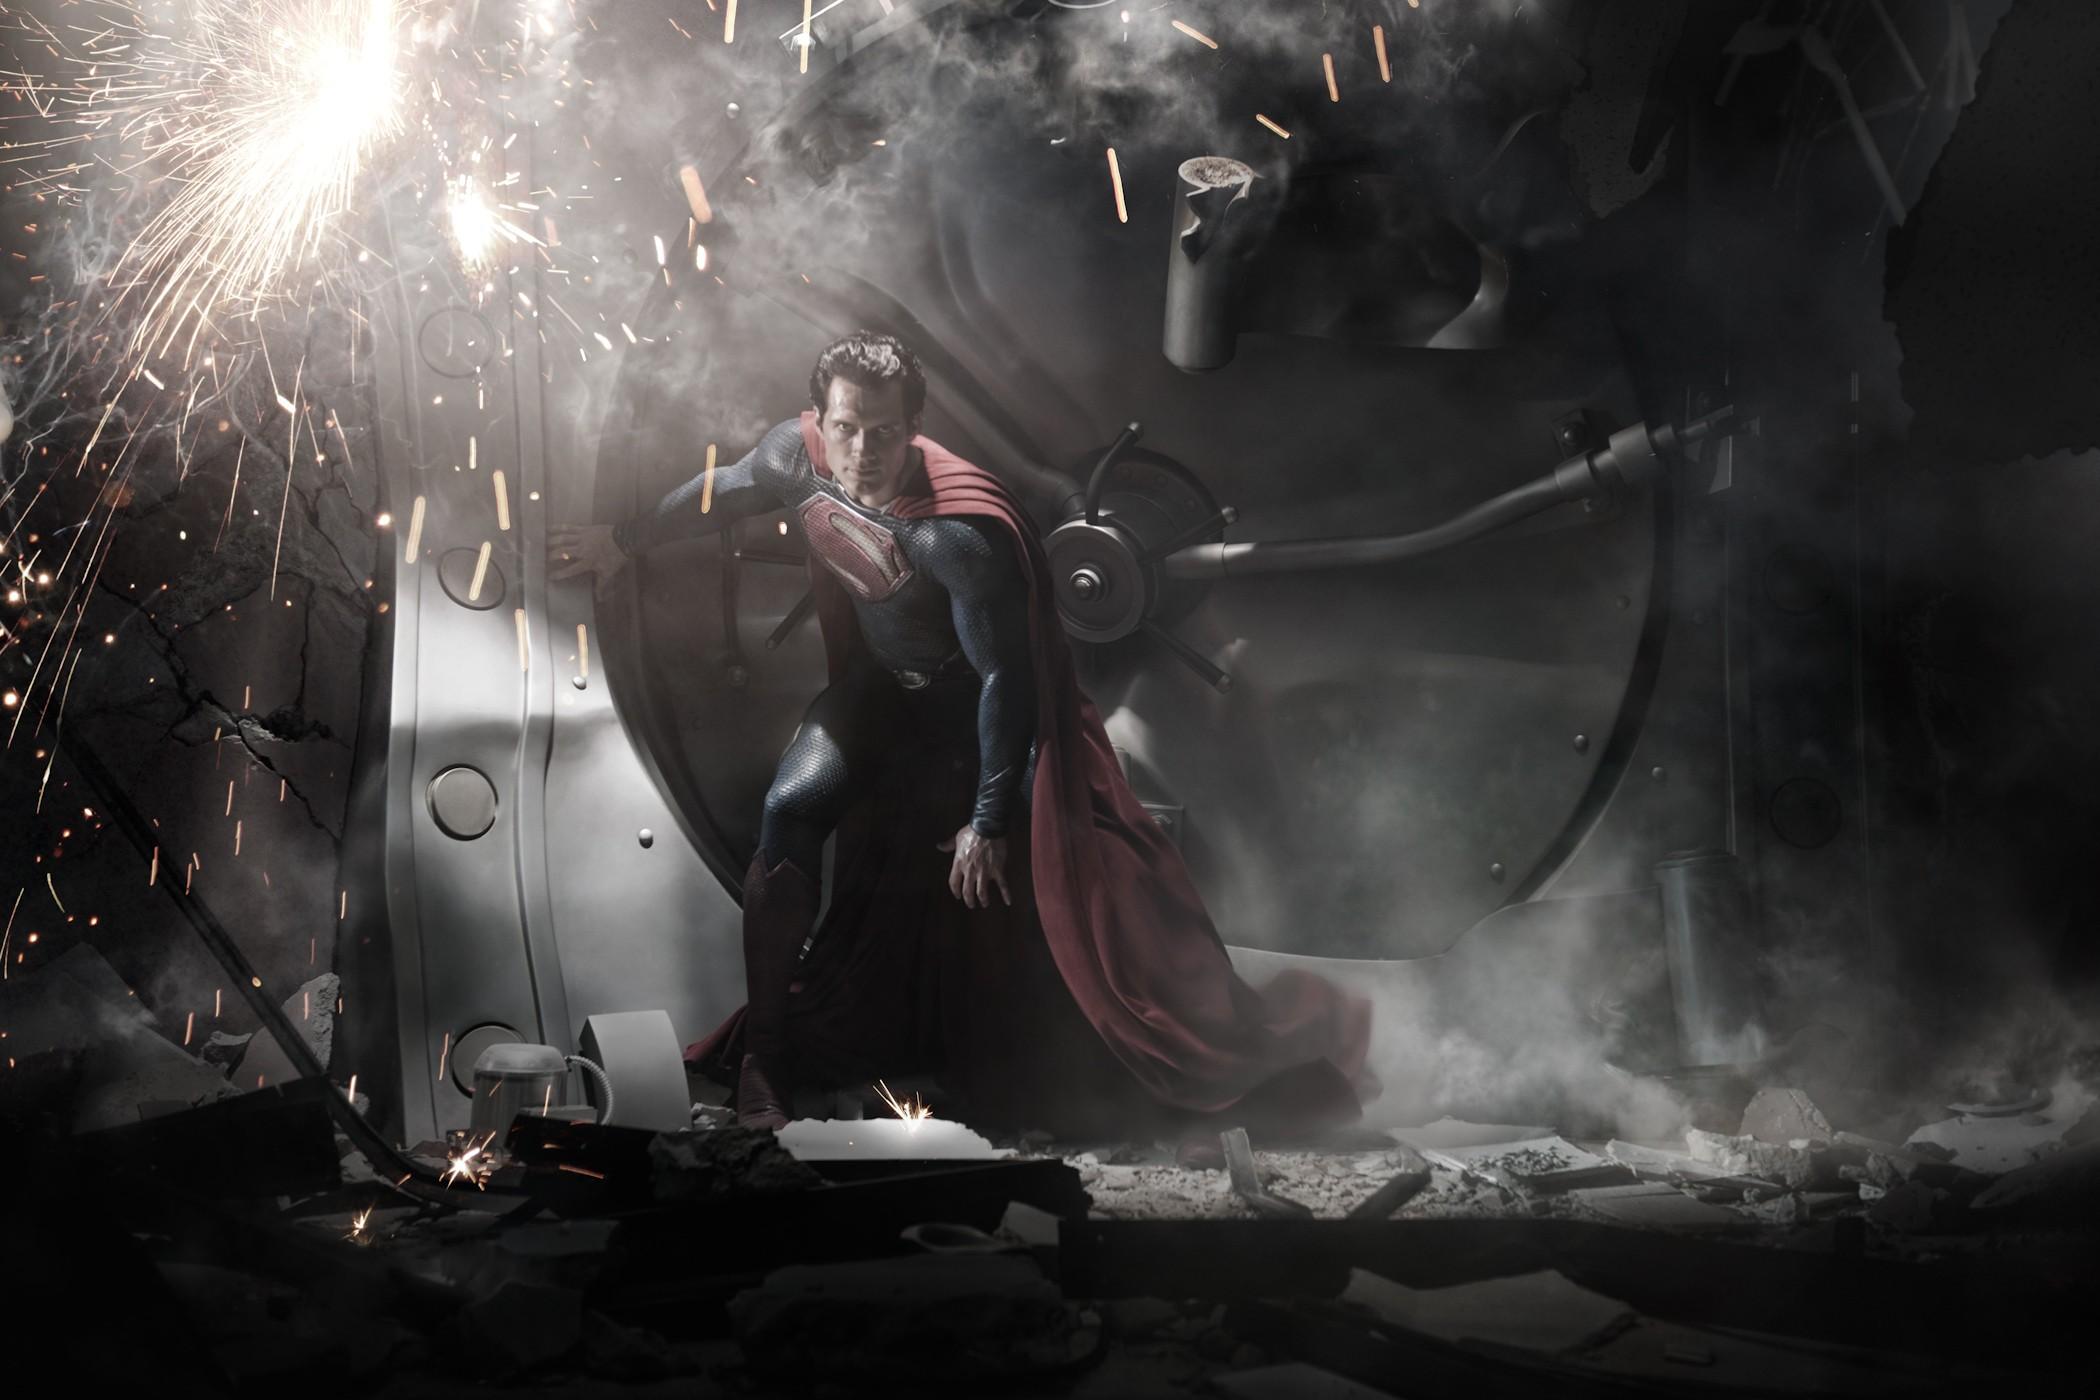 wallpaper di henry cavill in superman man of wallpaper di henry cavill 2100x1400